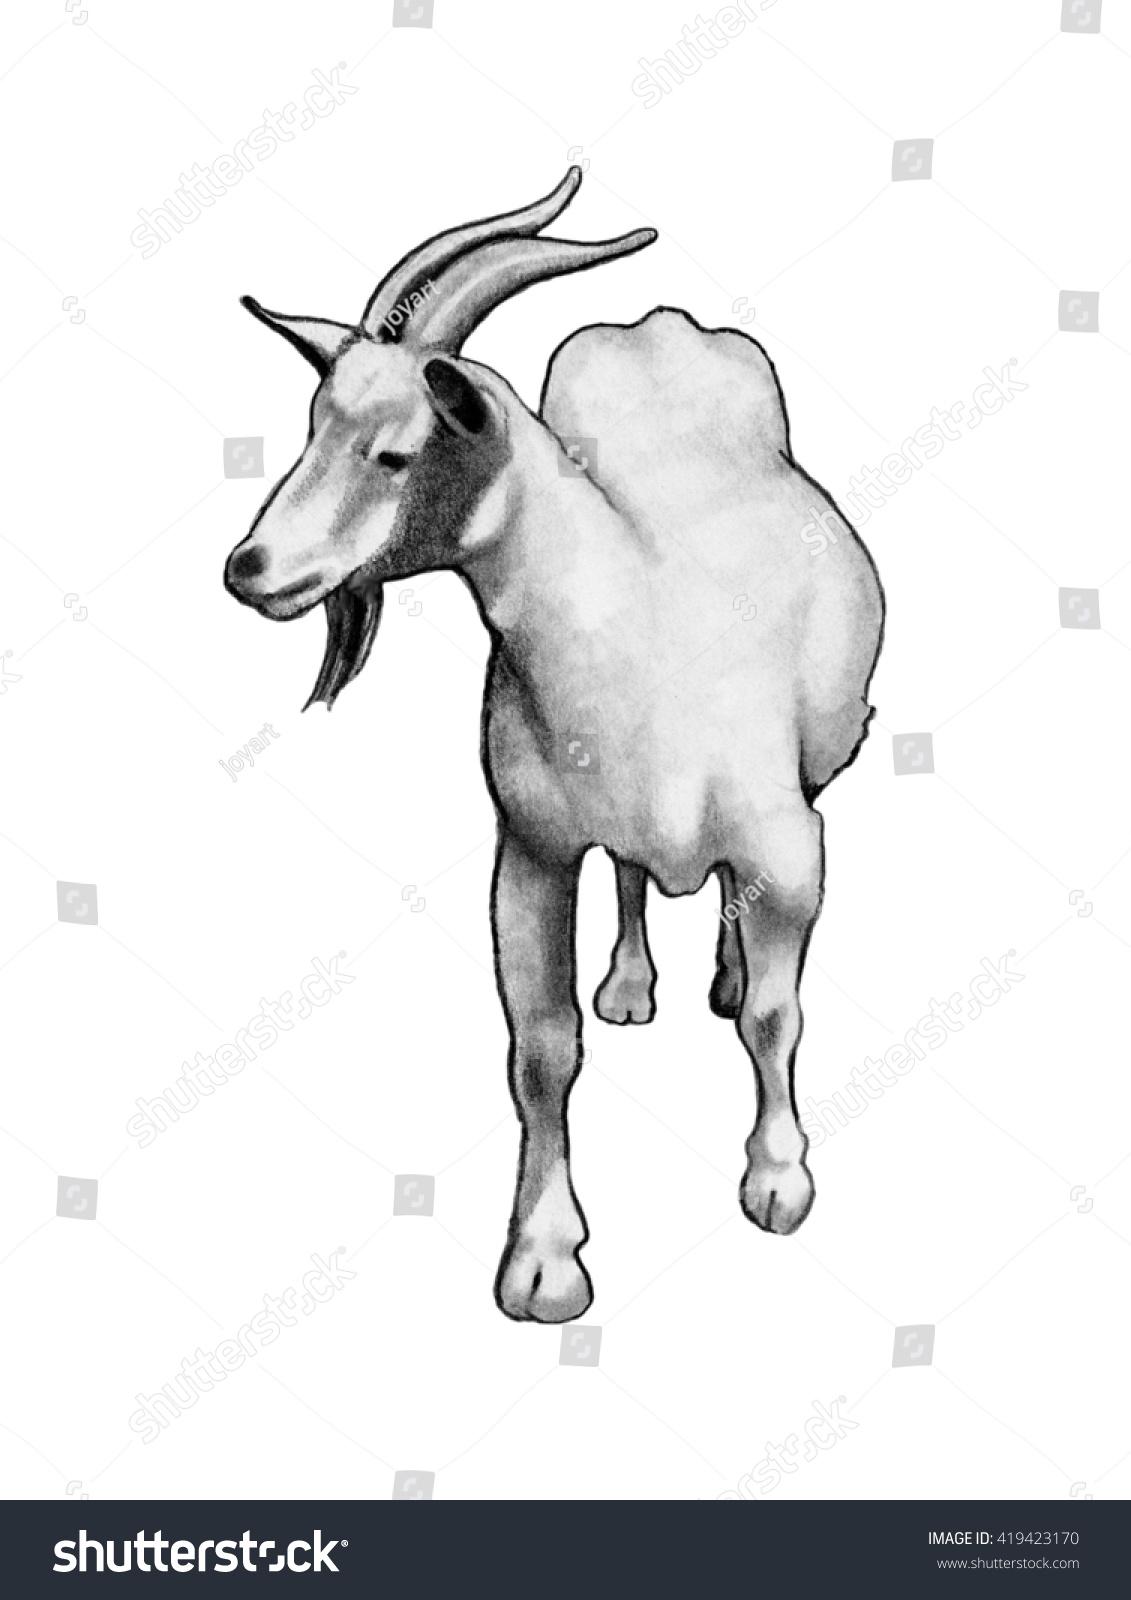 Goat farm animal in pencil drawing